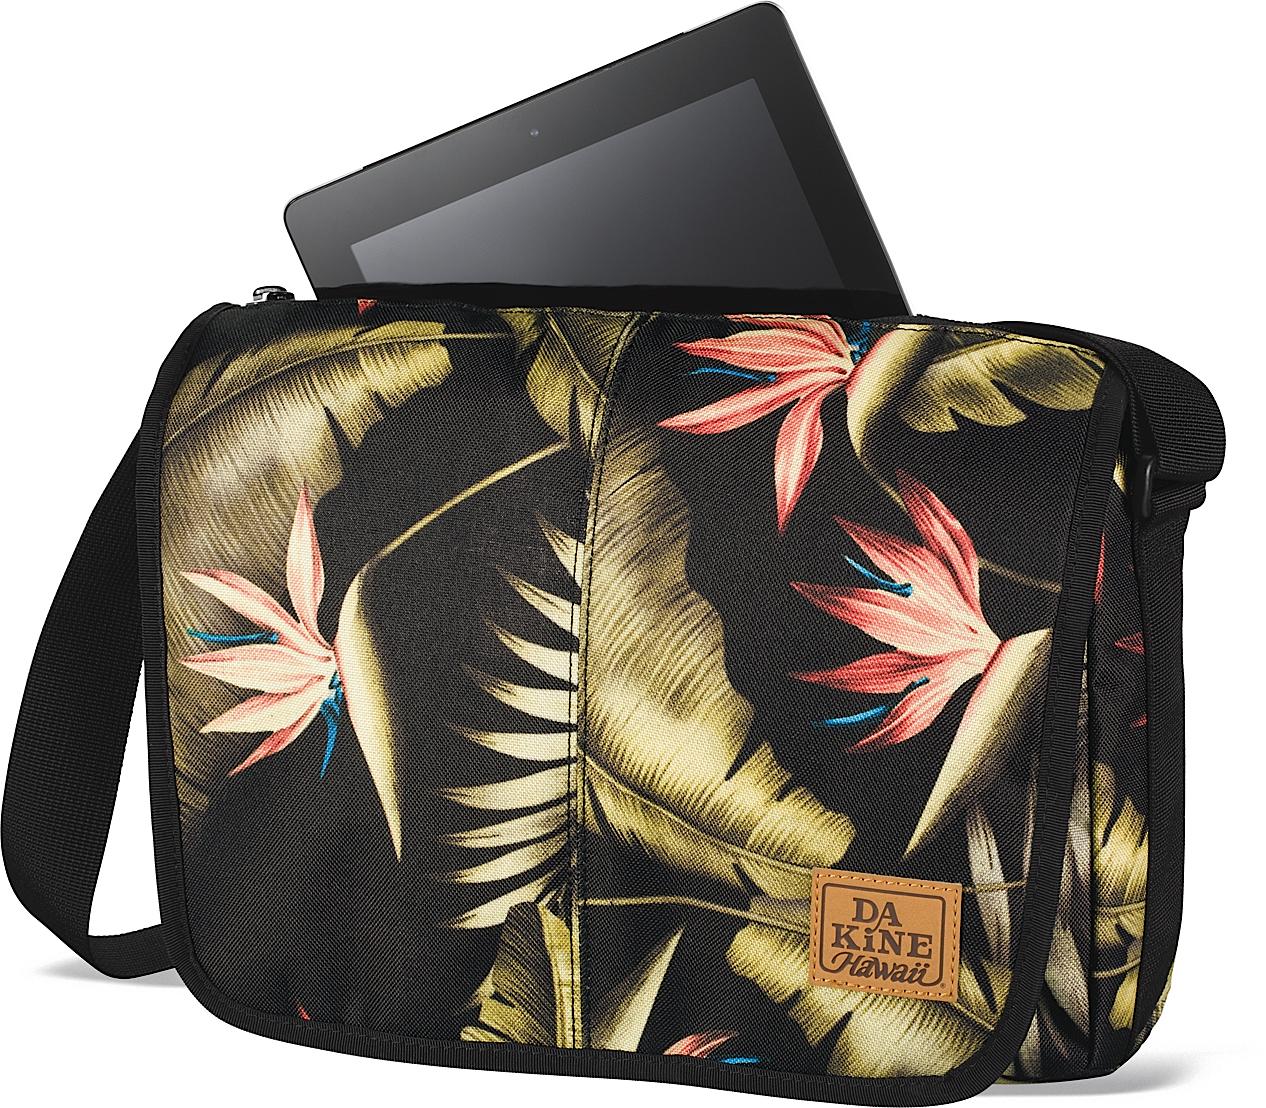 Унисекс Сумка через плечо Dakine OUTLET 8L PALM 2015S-08130142-Outlet8L-Palm.jpg